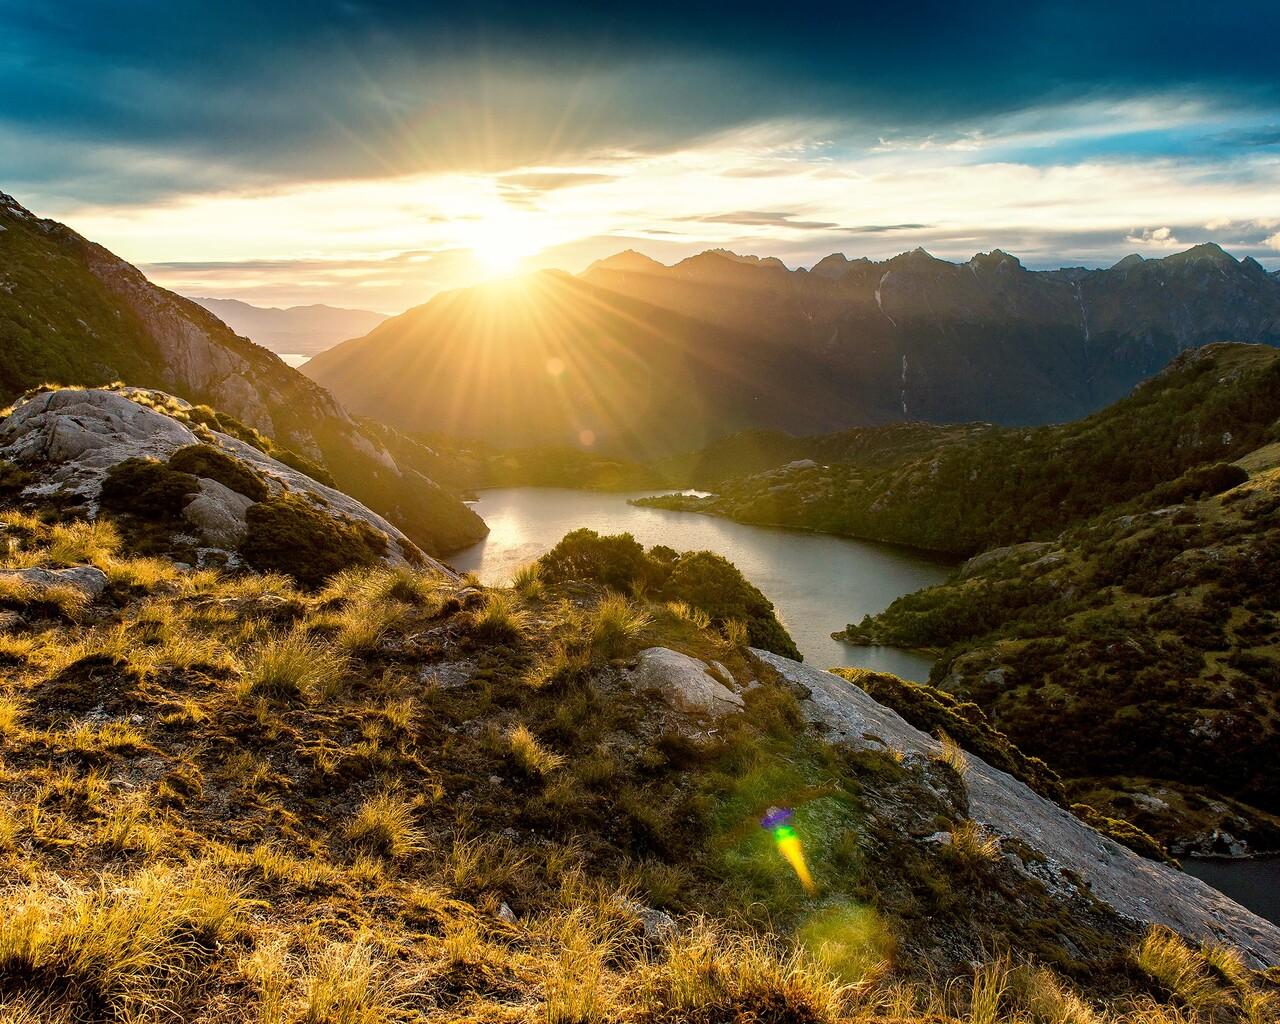 1280x1024 Fiordland Mountain Sunrise 1280x1024 Resolution Hd 4k